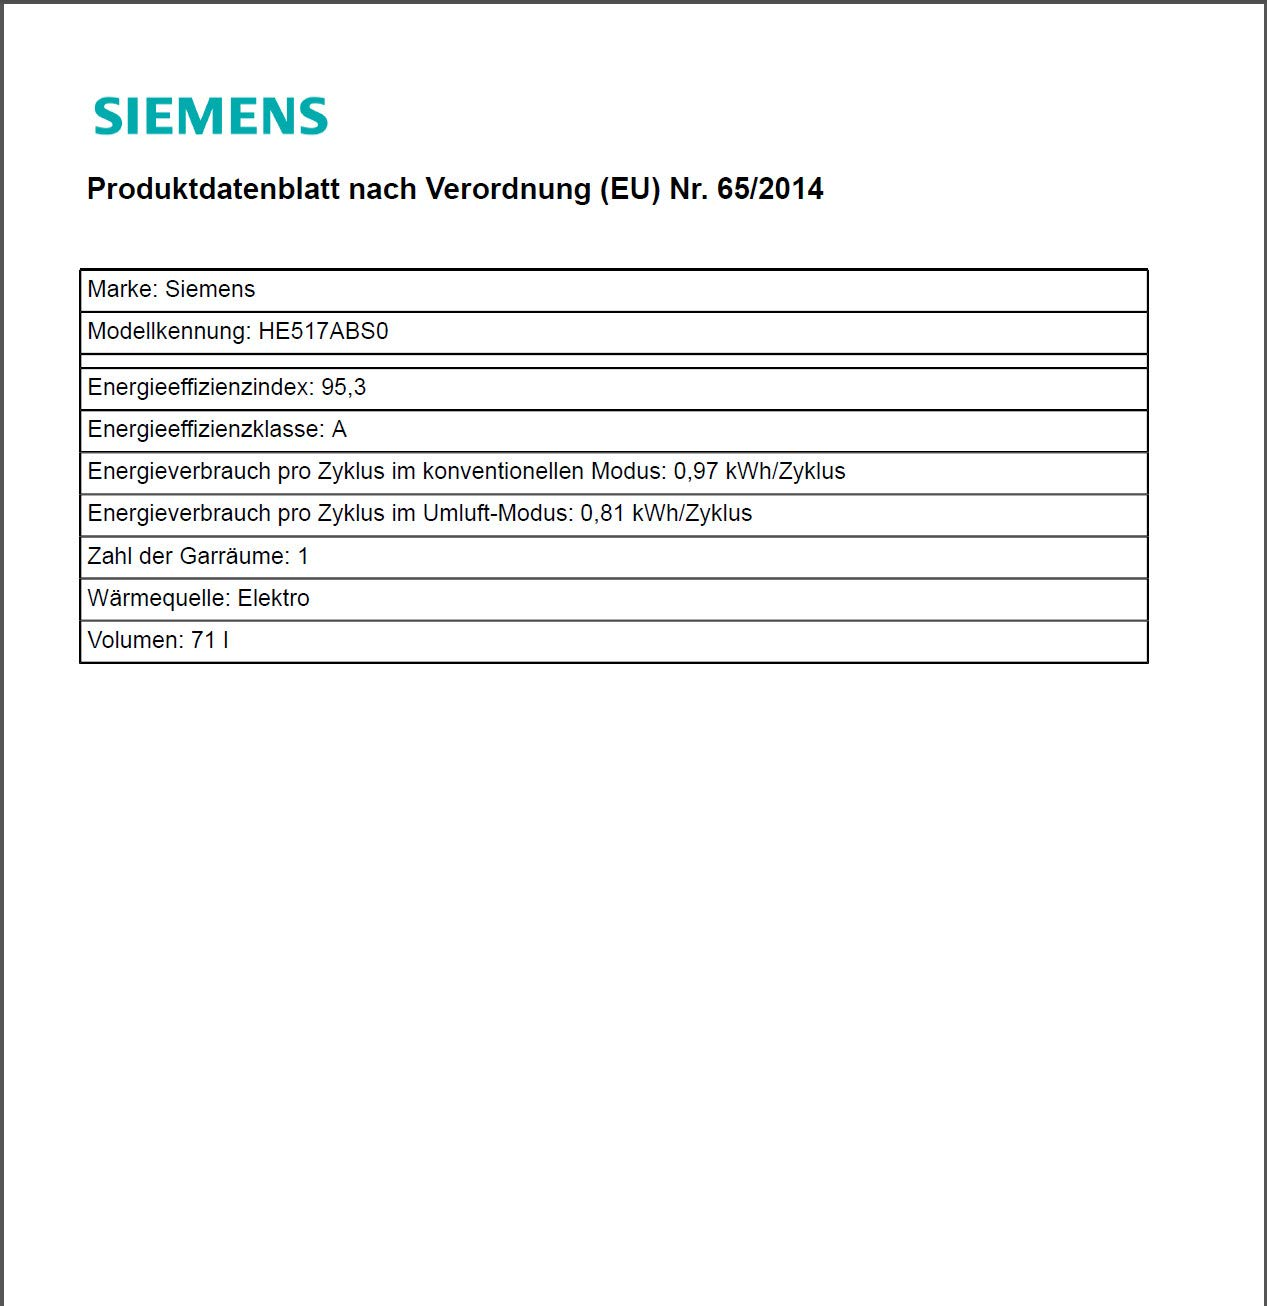 Siemens Eq521ka00 Herd Kochfeld Kombination Einbau 594 Cm